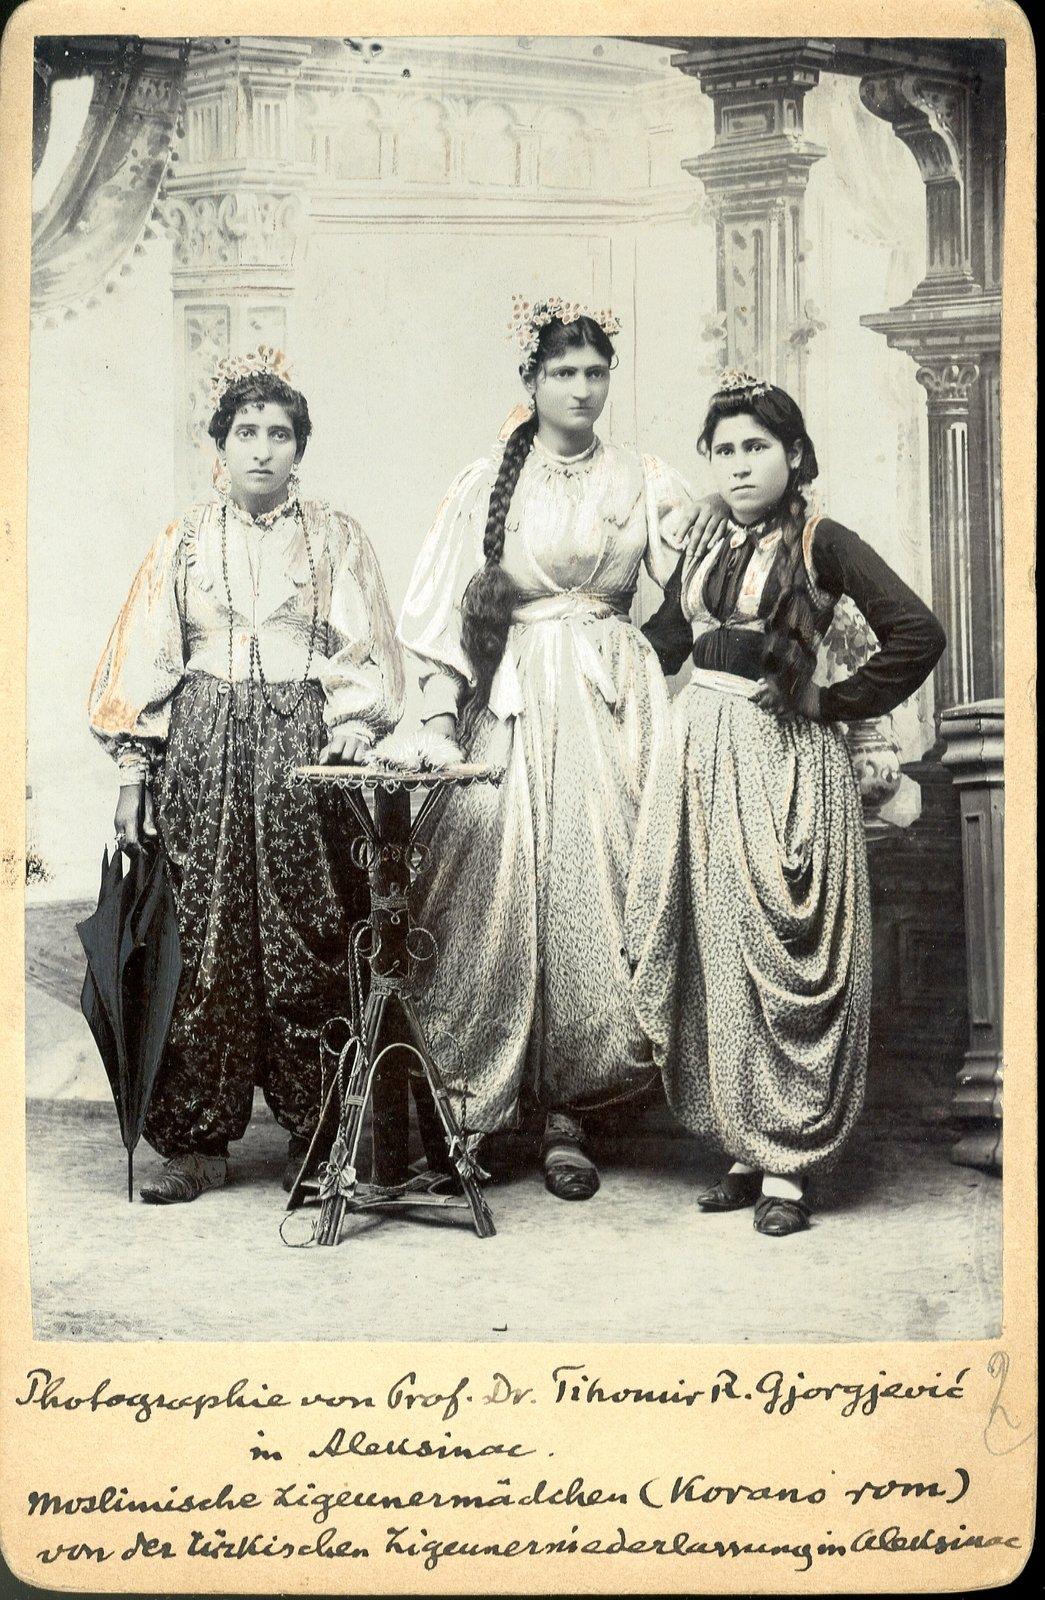 Three recently immigrated Roma (Korano Rom) girls in festive dress, 1900s , Mileta Rajković, National Library of Serbia, CC BY-NC